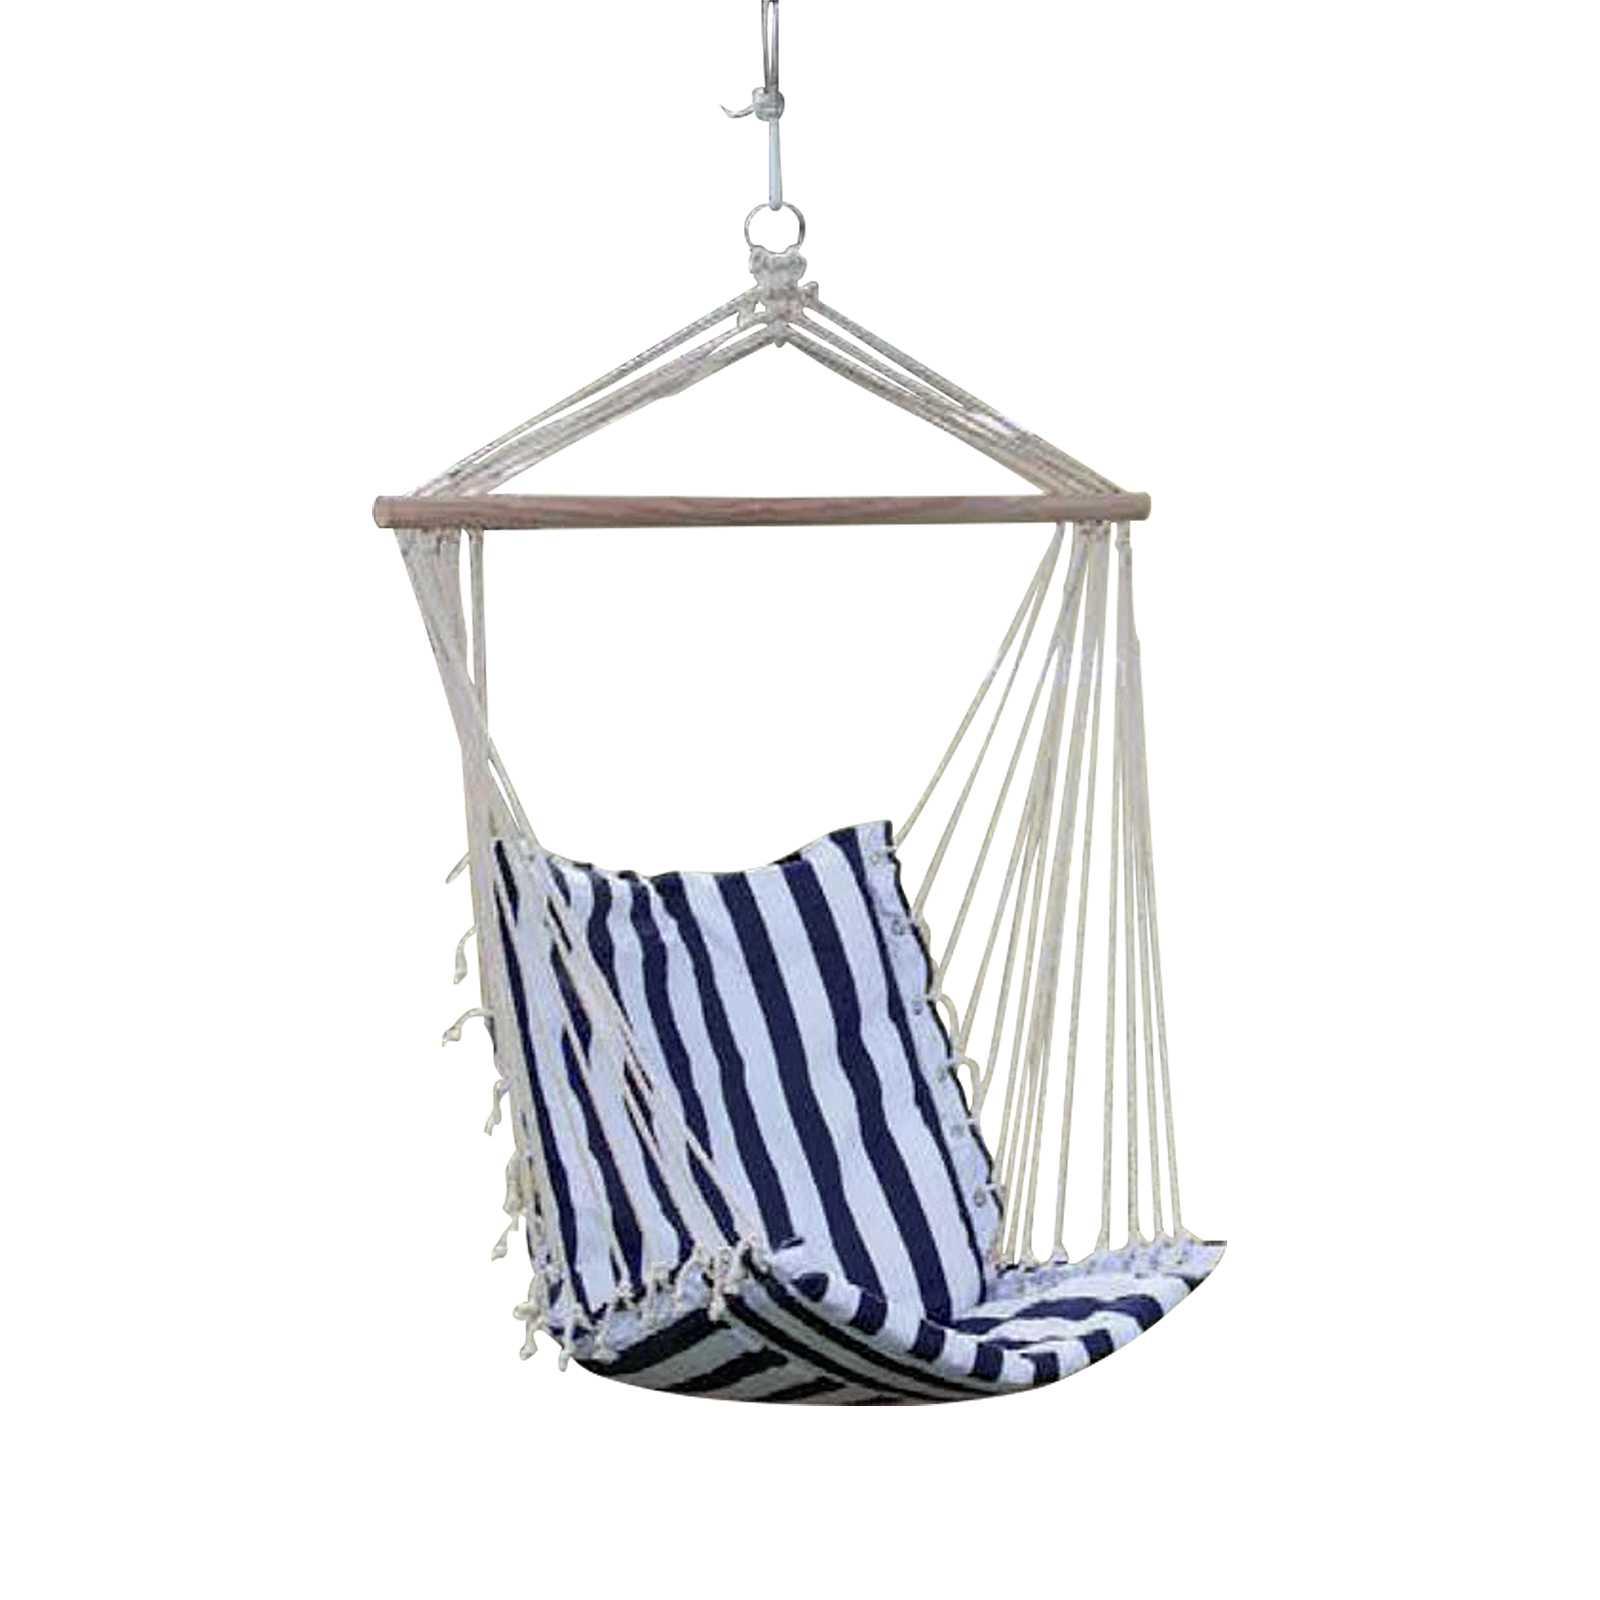 Seduta sospesa per outdoor con telo in tessuto portata massima 100 kg